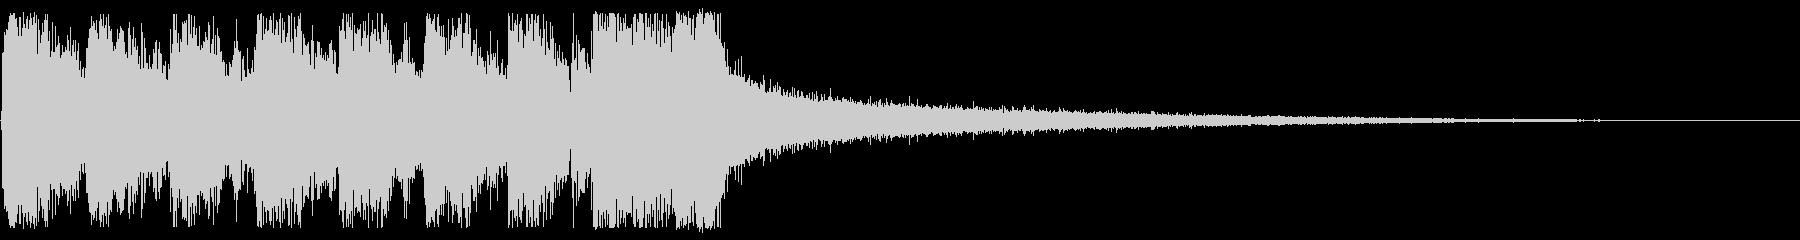 KANTホーンセクションジングルの未再生の波形